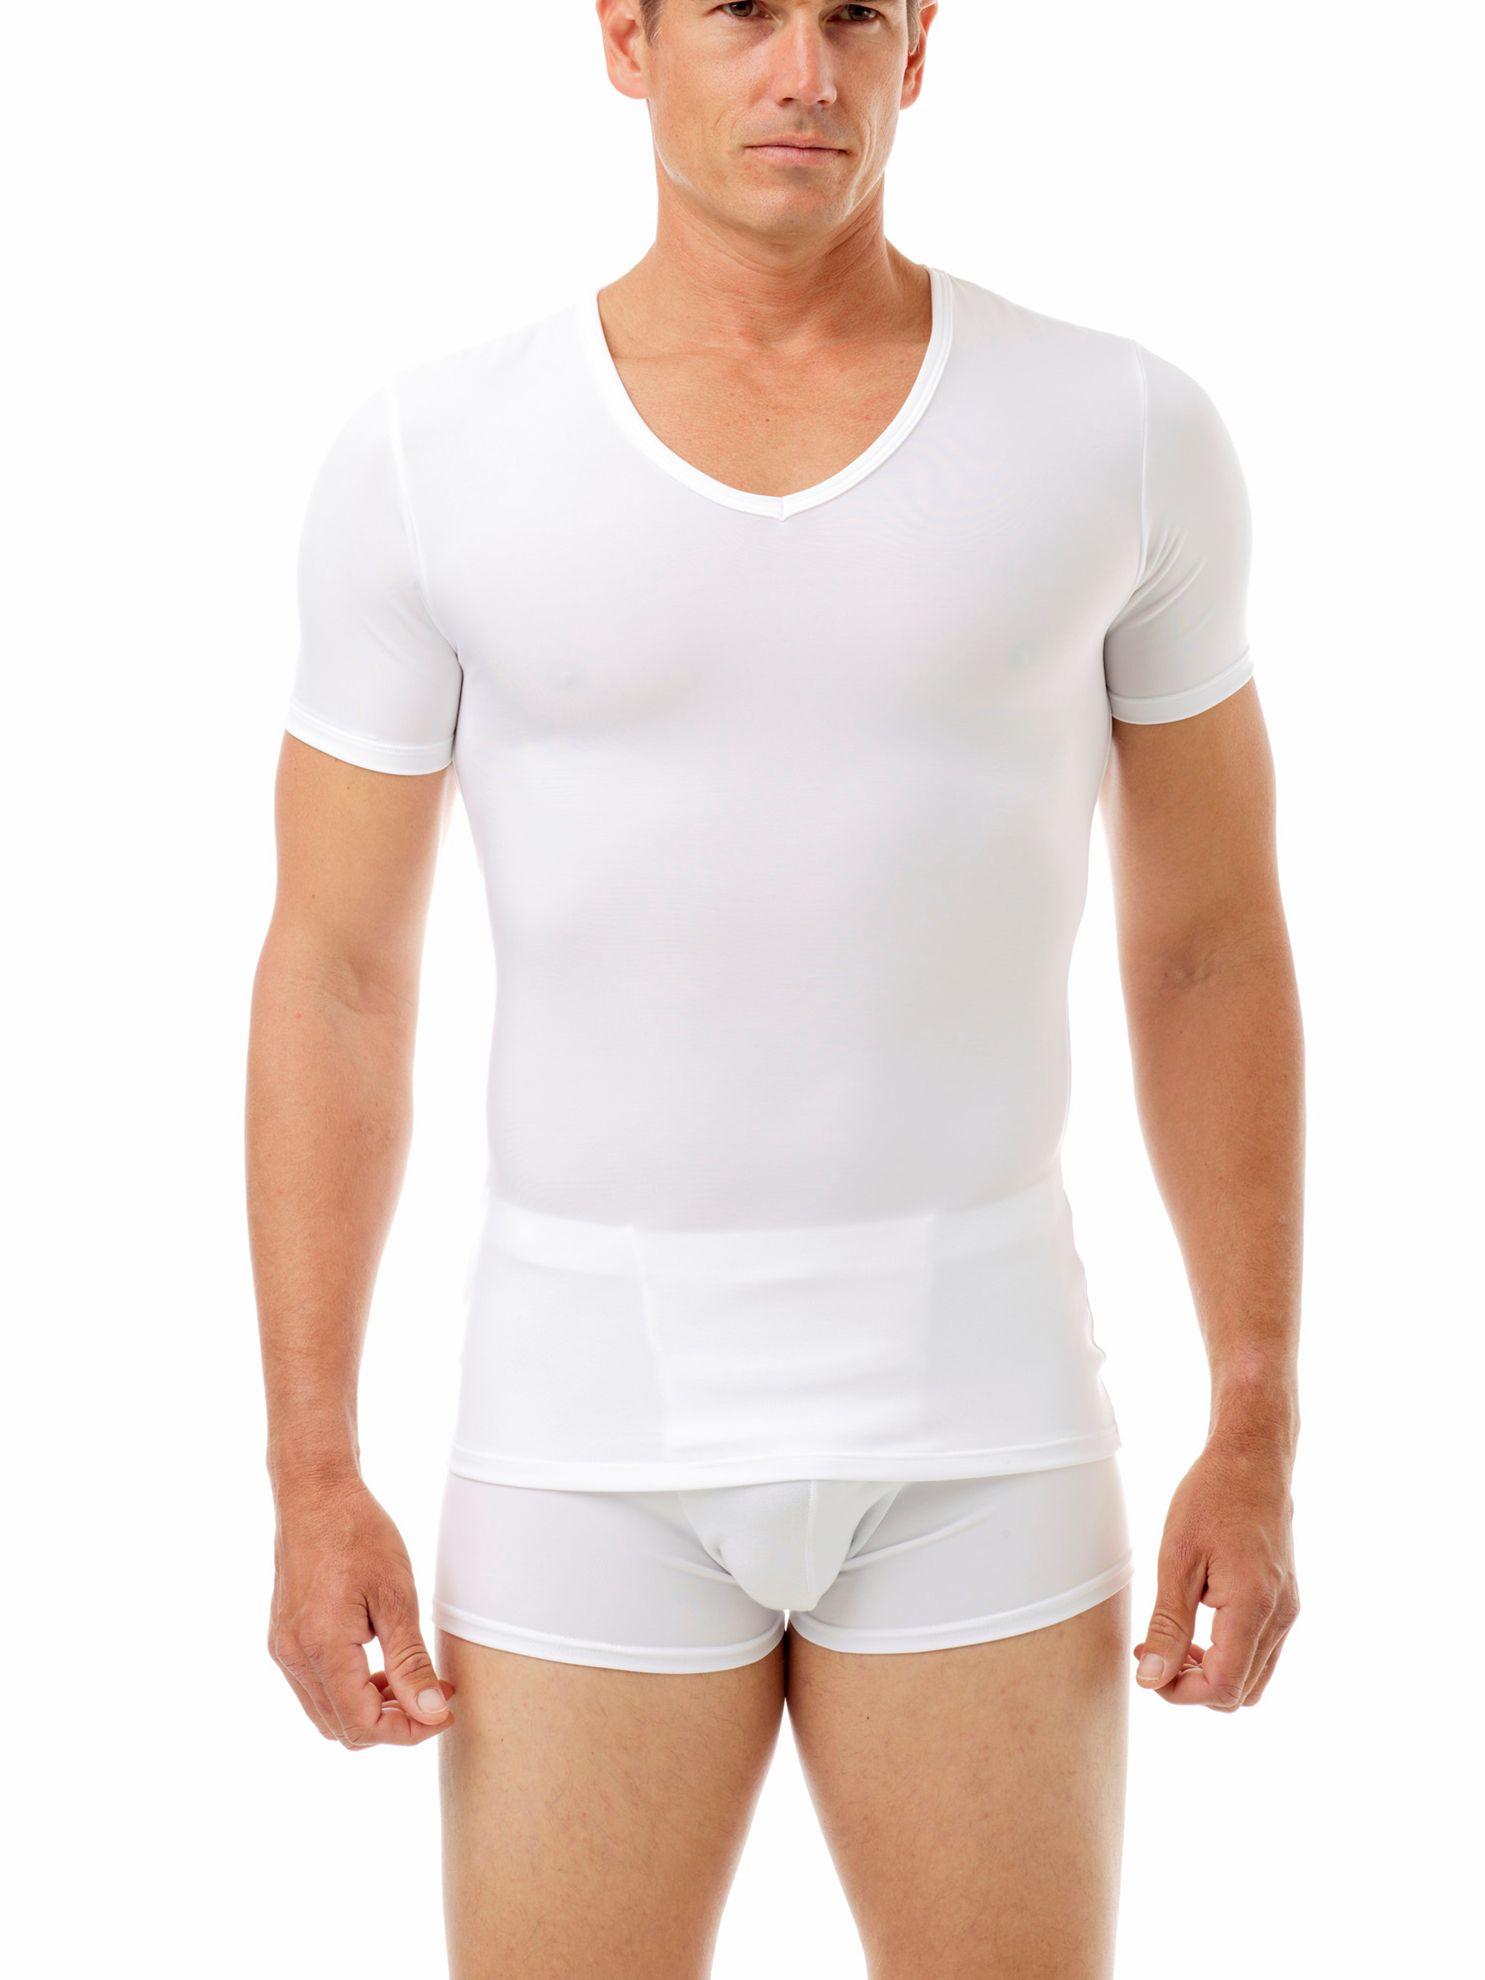 Picture of Microfiber V-Neck Compression T-Shirt